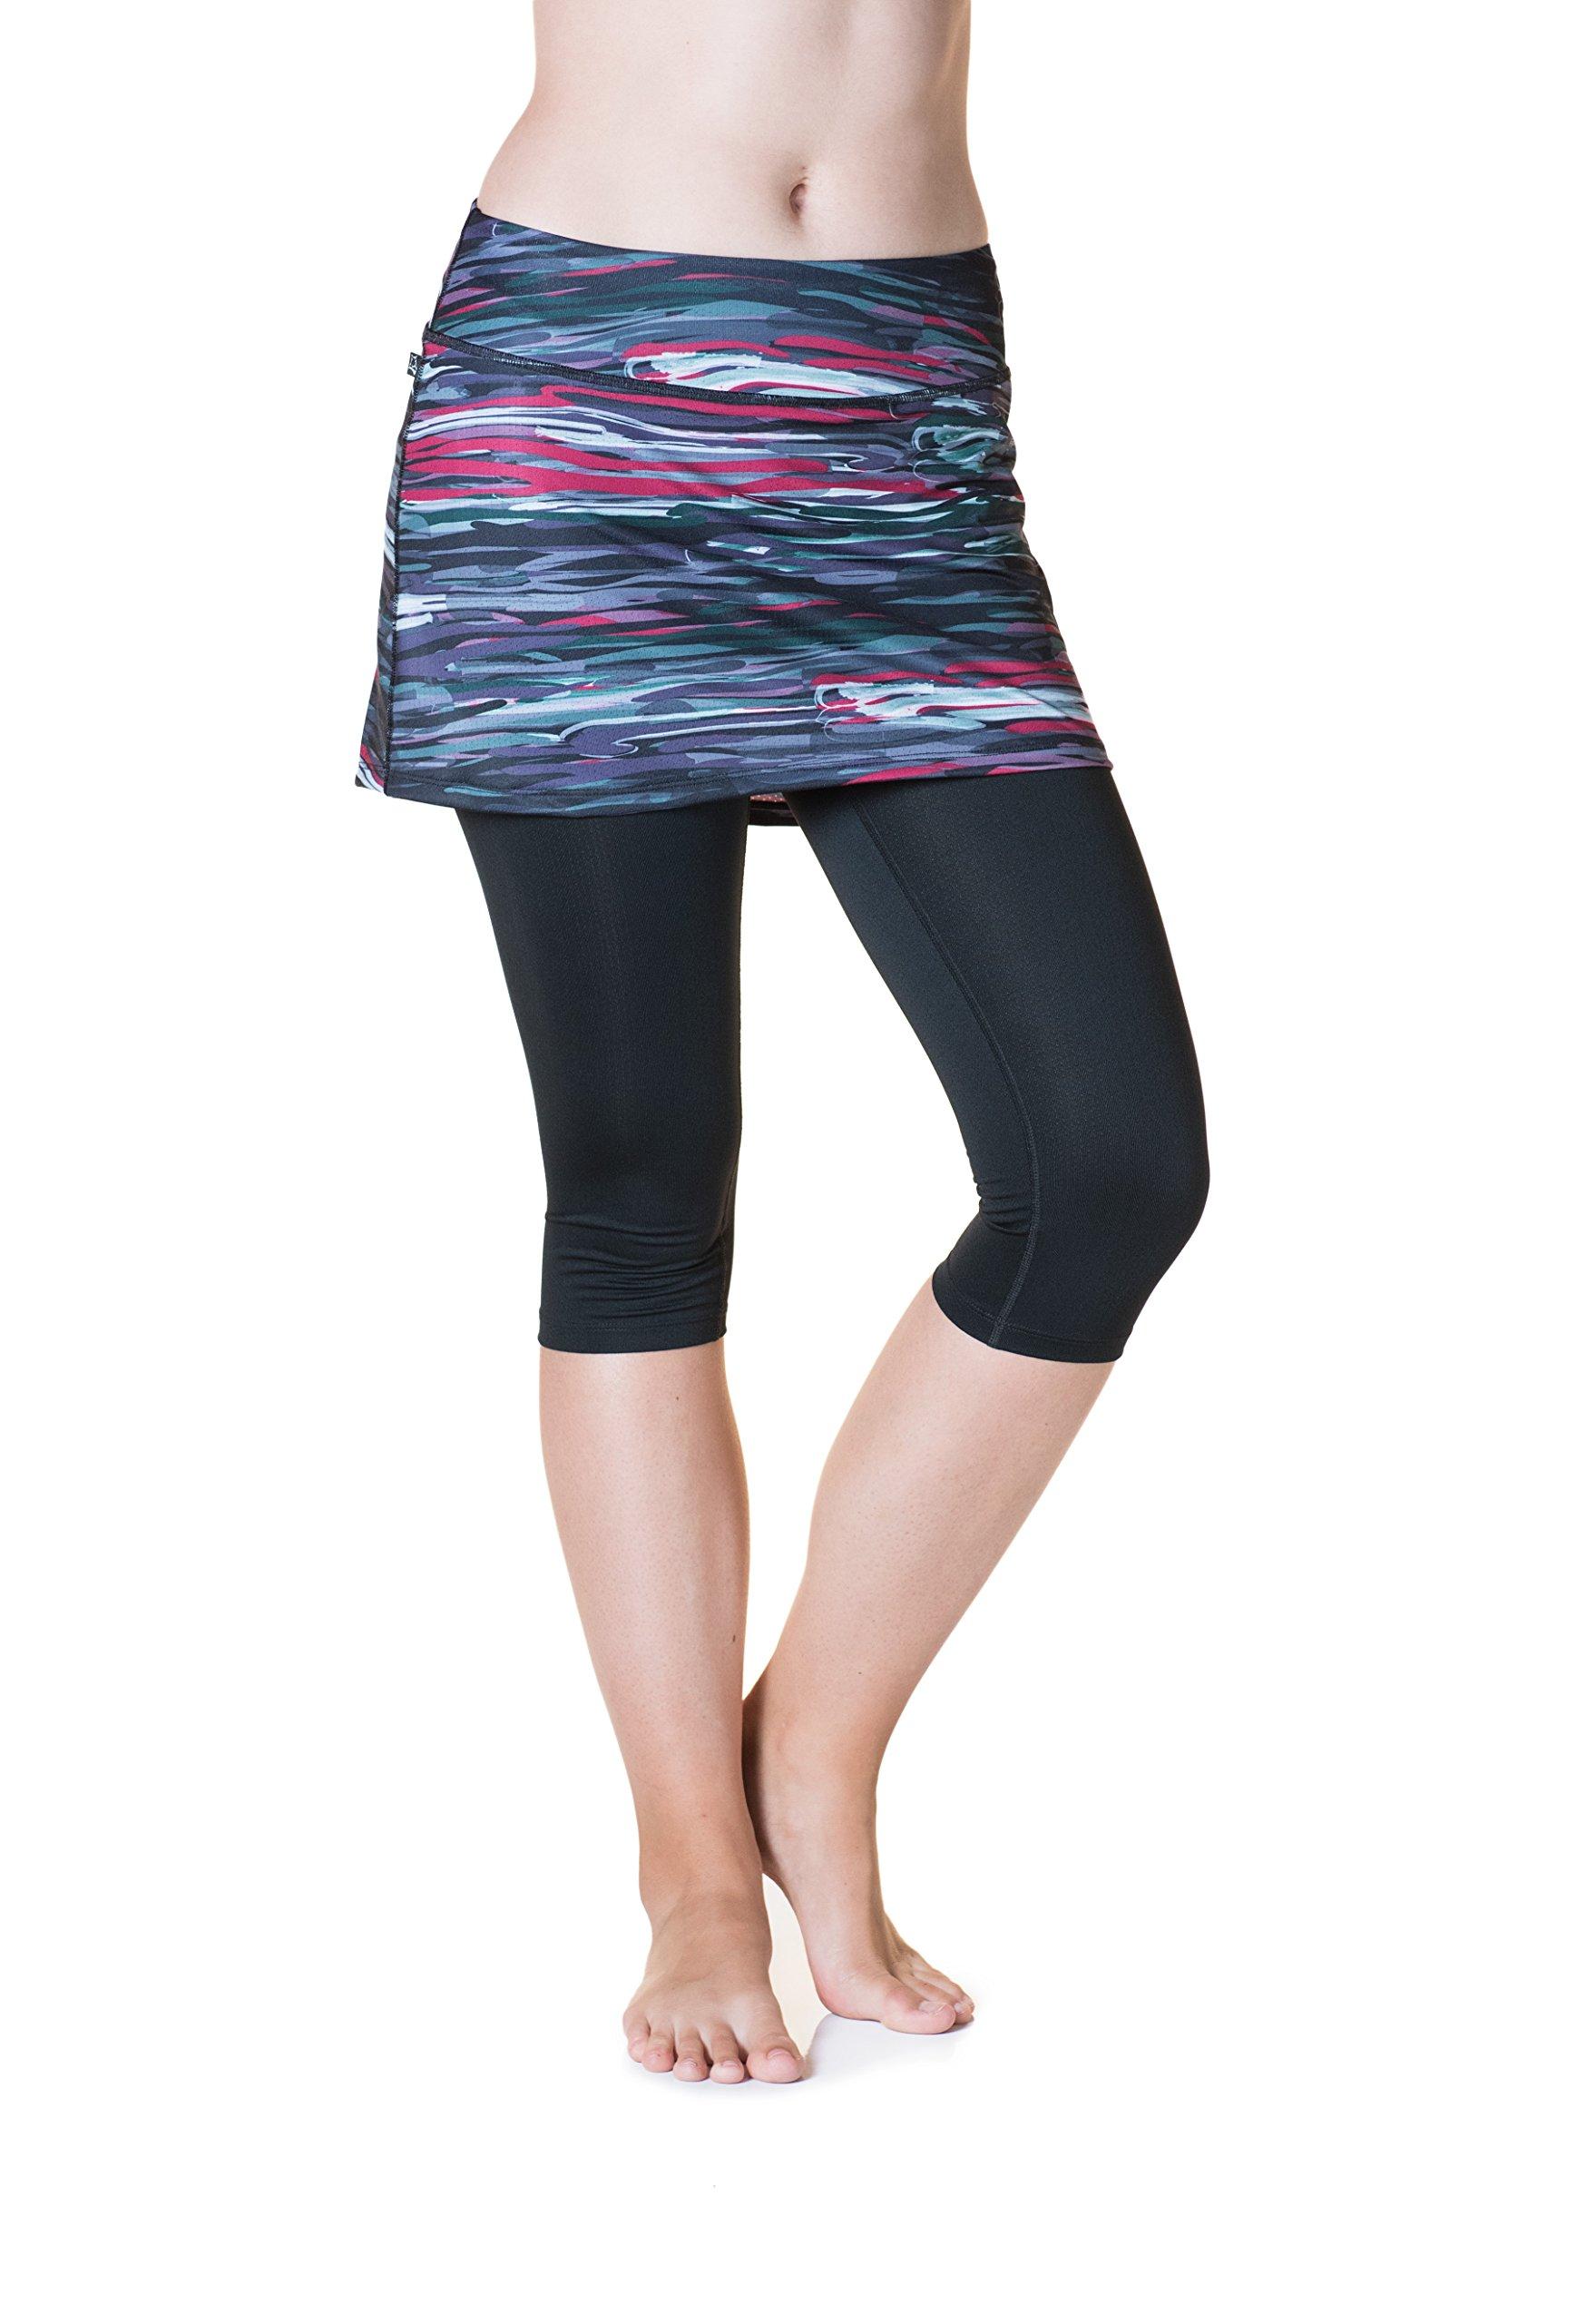 Skirt Sports Women's Lotta Breeze Capri Skirt, Romance Print/Black, Medium